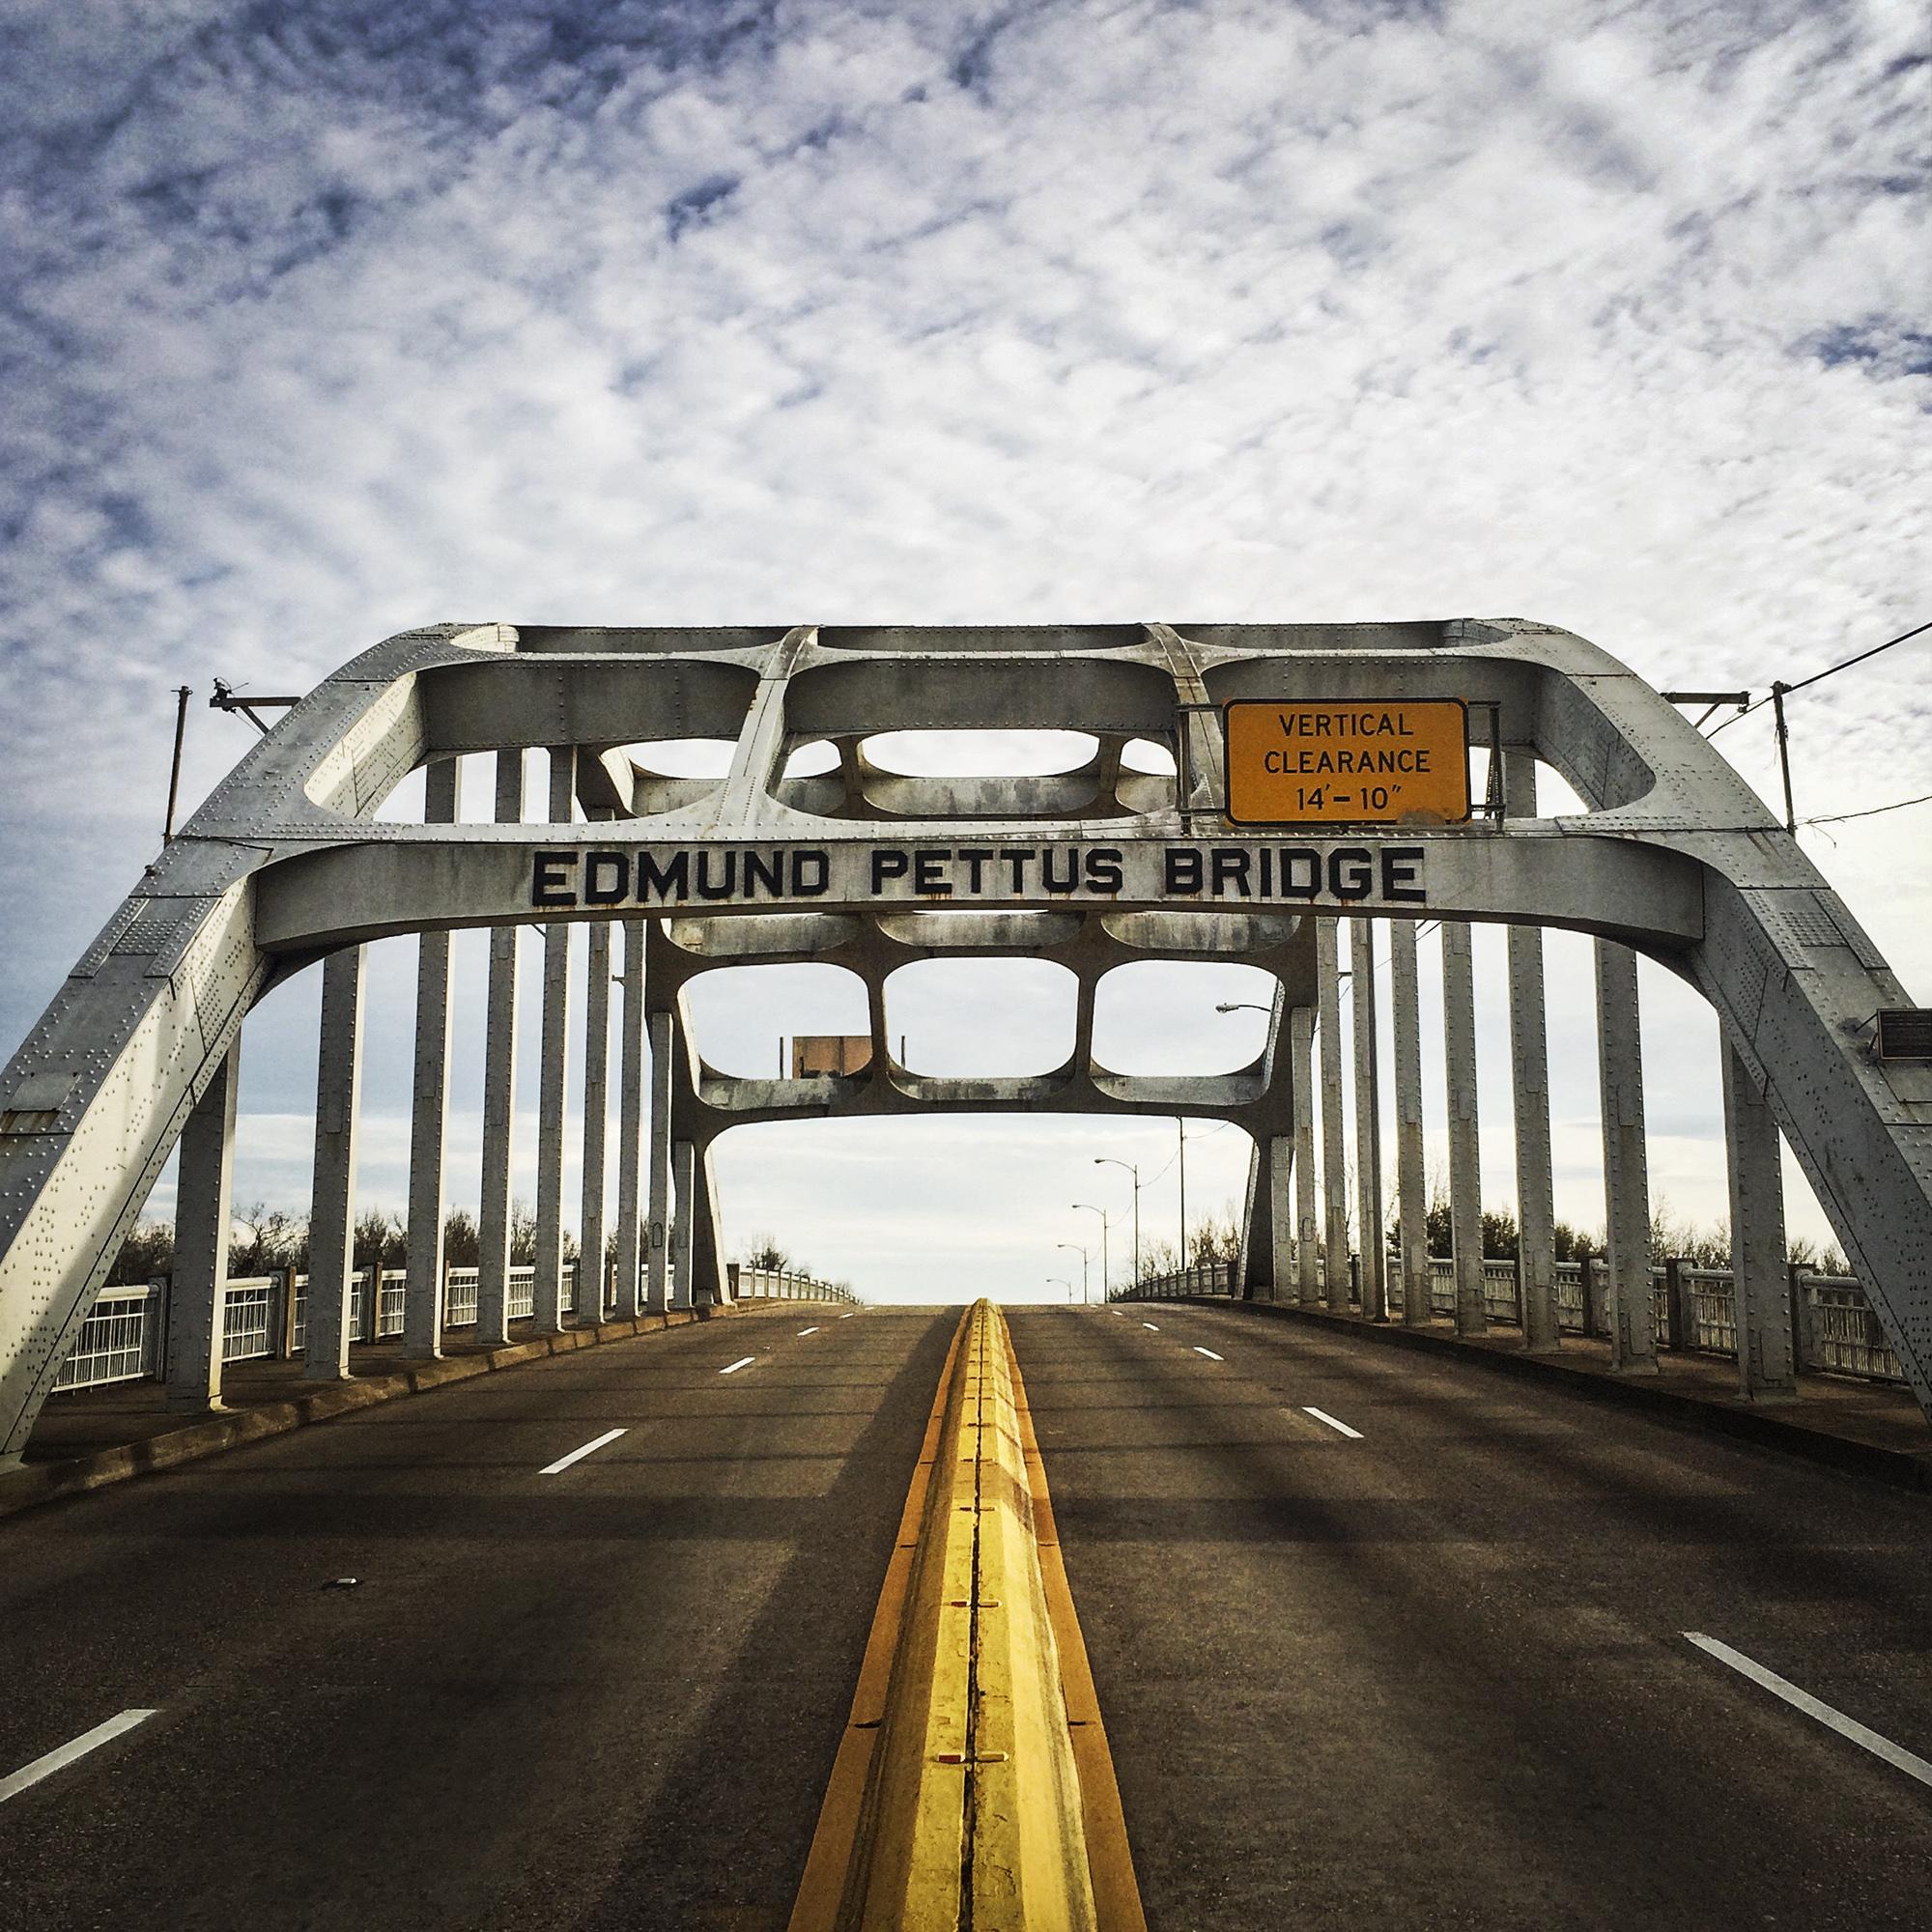 Edmund Pettus Bridge, Selma Alabama, 2015